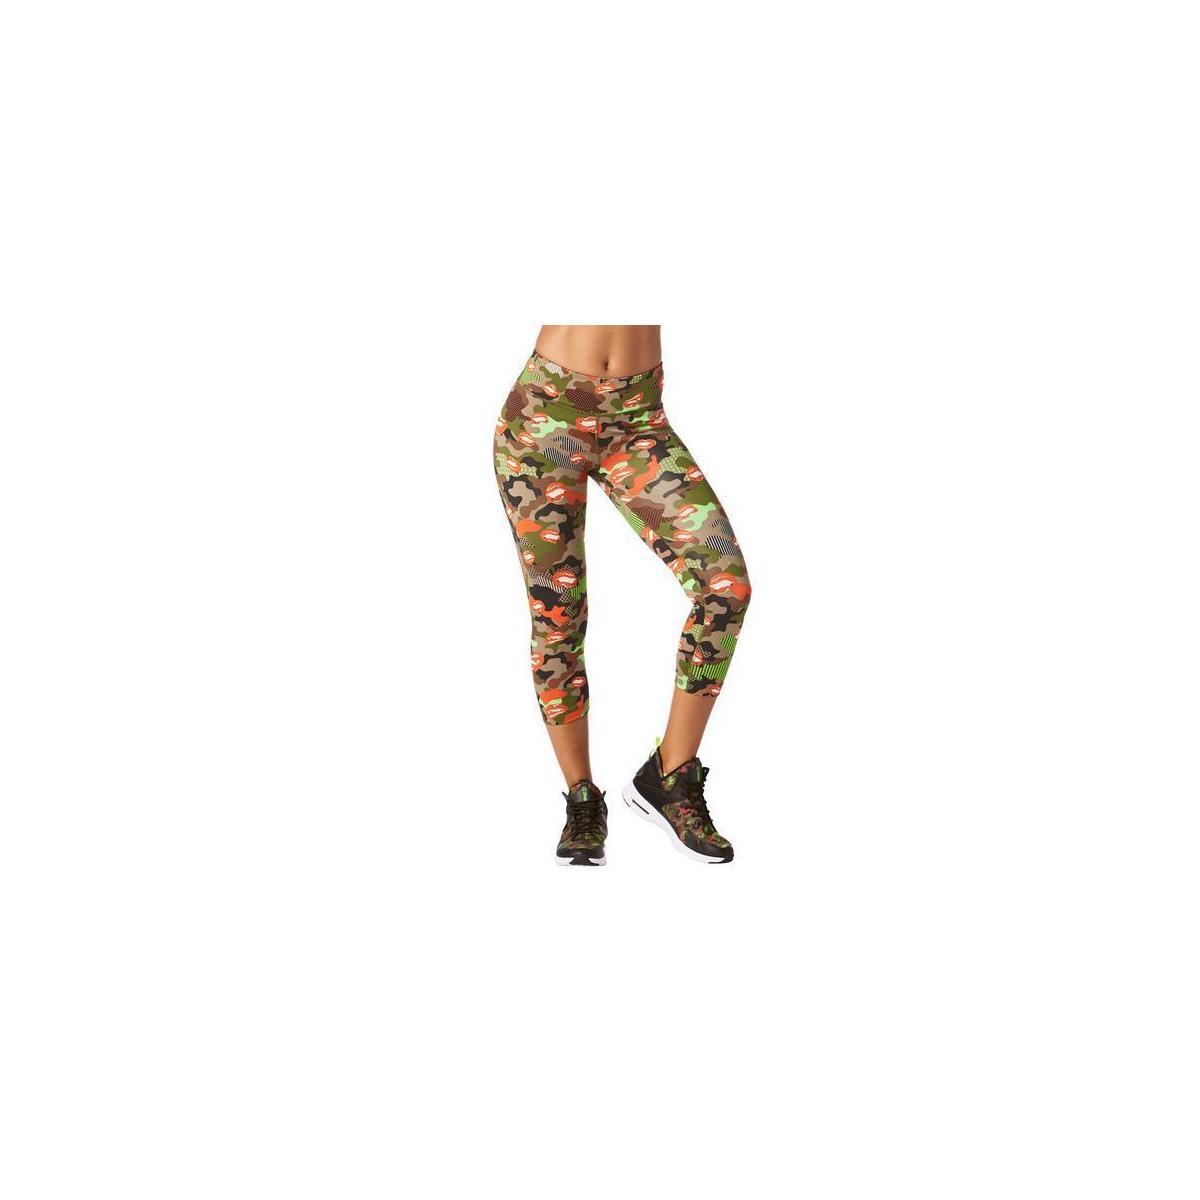 Zumba Dance Fitness Compression Pants Athletic Workout Print Capri Leggings for Women,  Heatwave, Medium